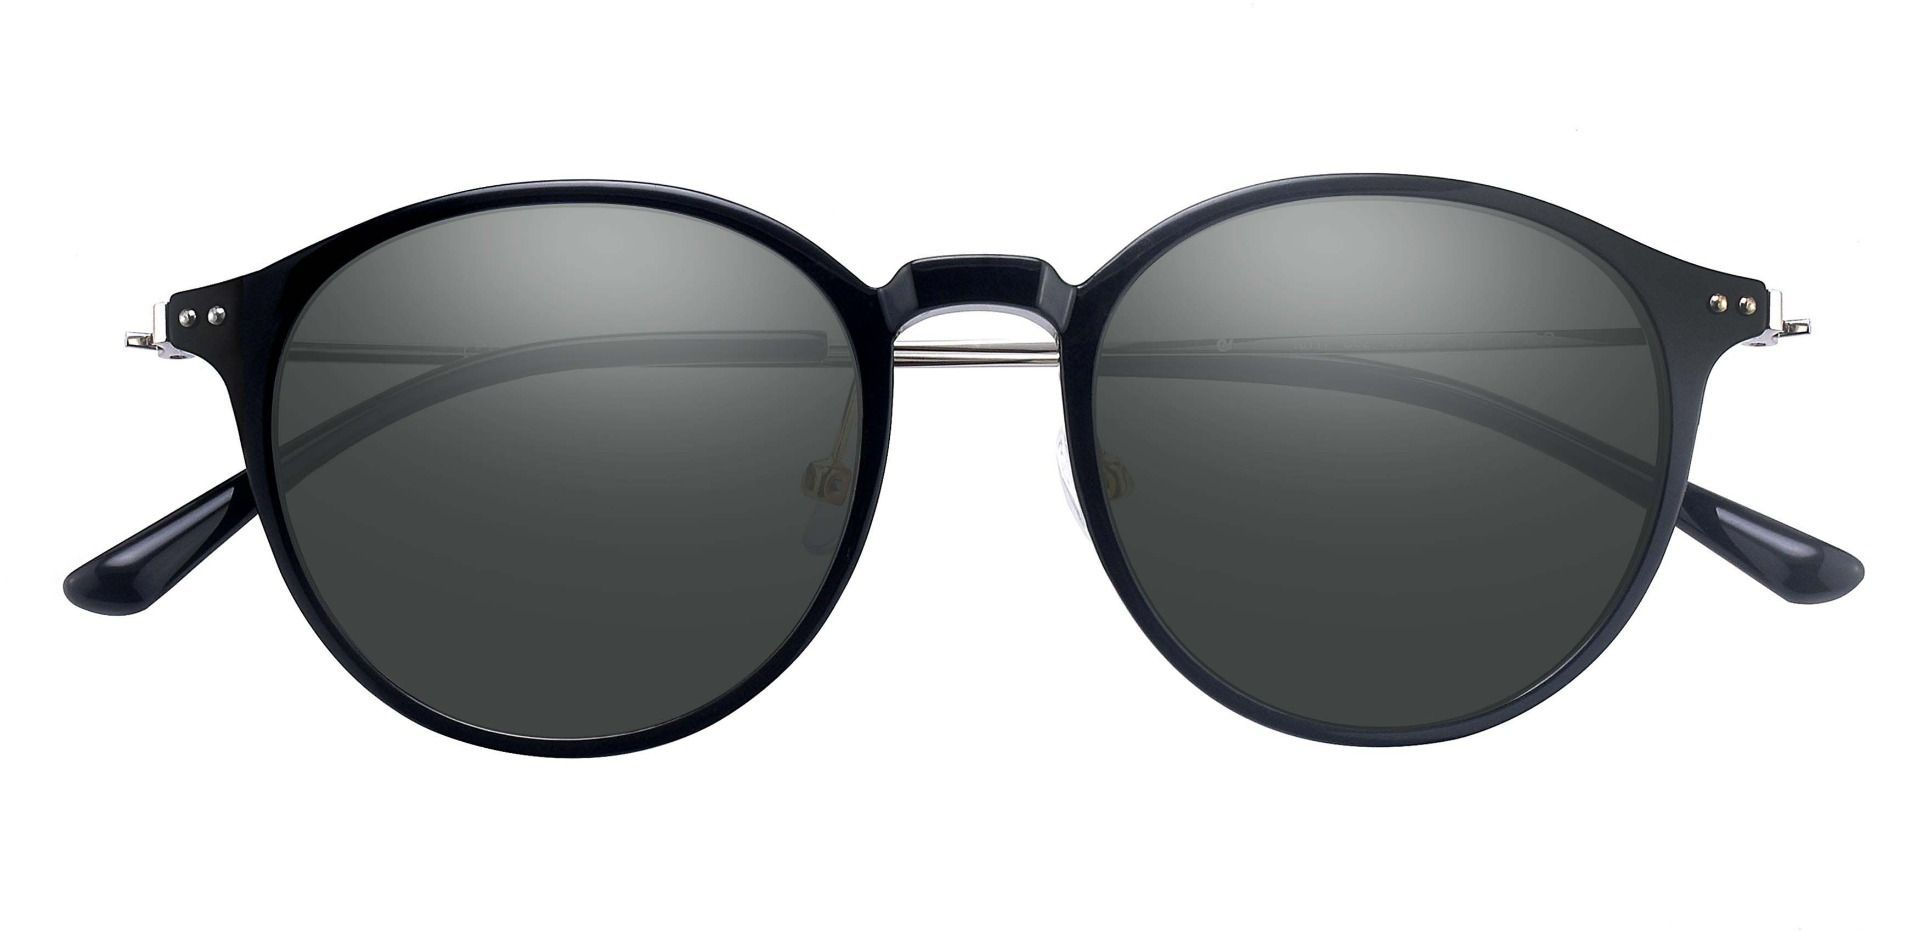 Meyer Round Prescription Sunglasses - Black Frame With Gray Lenses